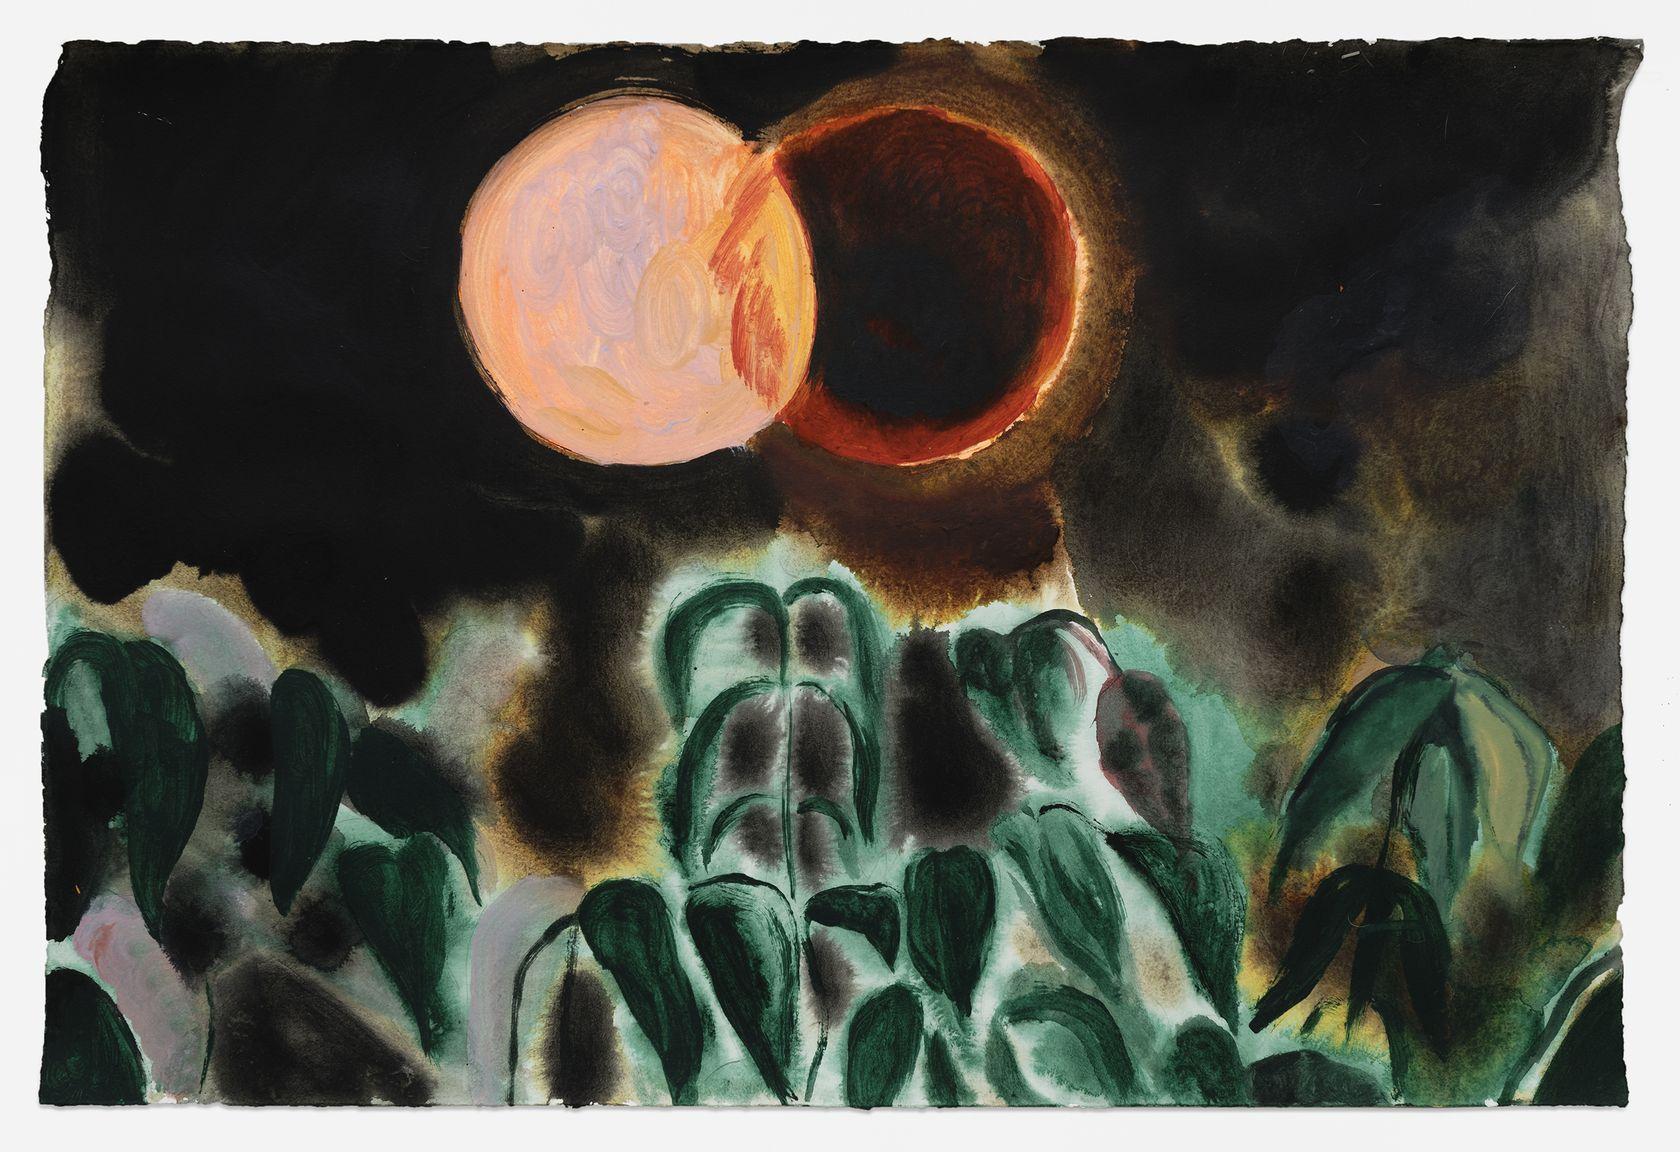 Anthony Cudahy, Imprint moon, 2021 Acrylique sur papier58.5 × 83.5 × 3.5 cm / 23  × 32 7/8 × 1 3/8 in. (encadré/framed)